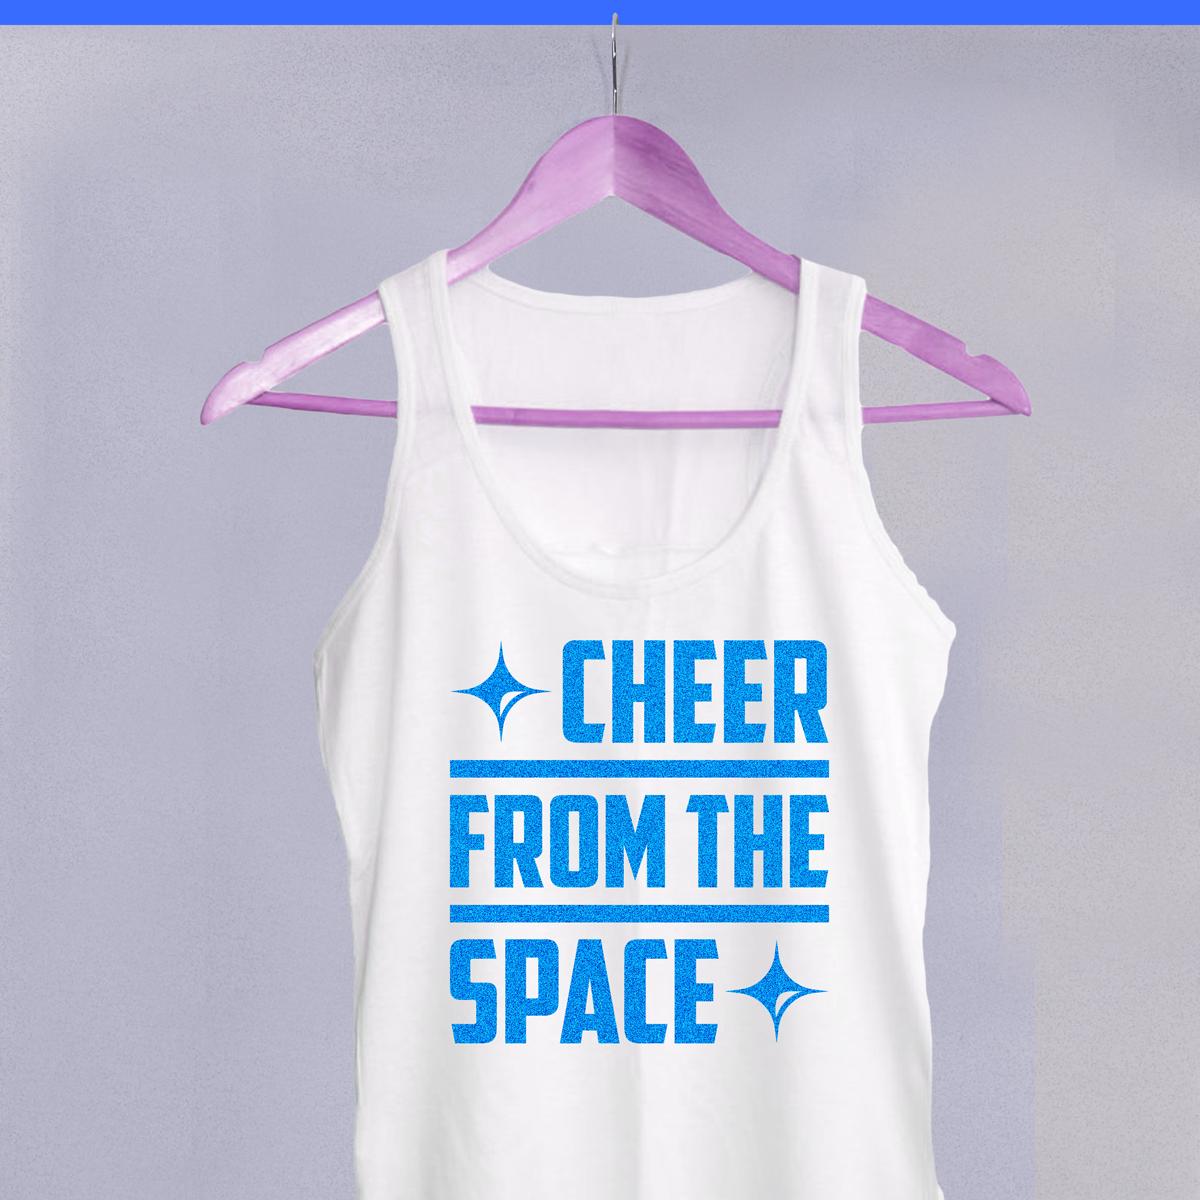 cheer-from-the-space-kirale-2018-cheerleading-wear-gif-tees-fuckin-cheerleader-fashion-design-sportwear-apparel-cheer-uniforms-cheerbows-2_dettaglio2